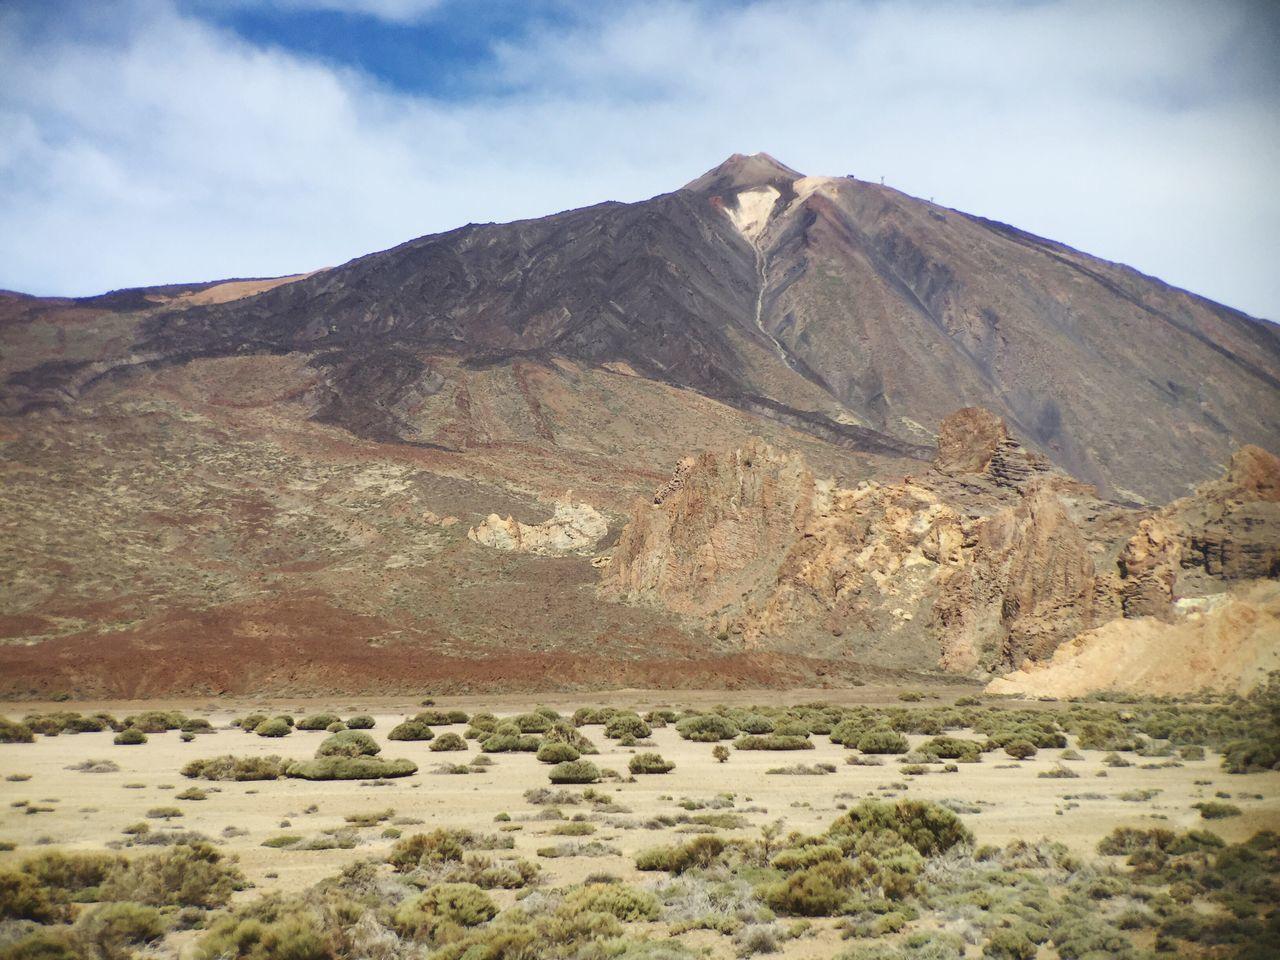 Parque Nacional Del Teide El Teide Tenerife Mountain Desert